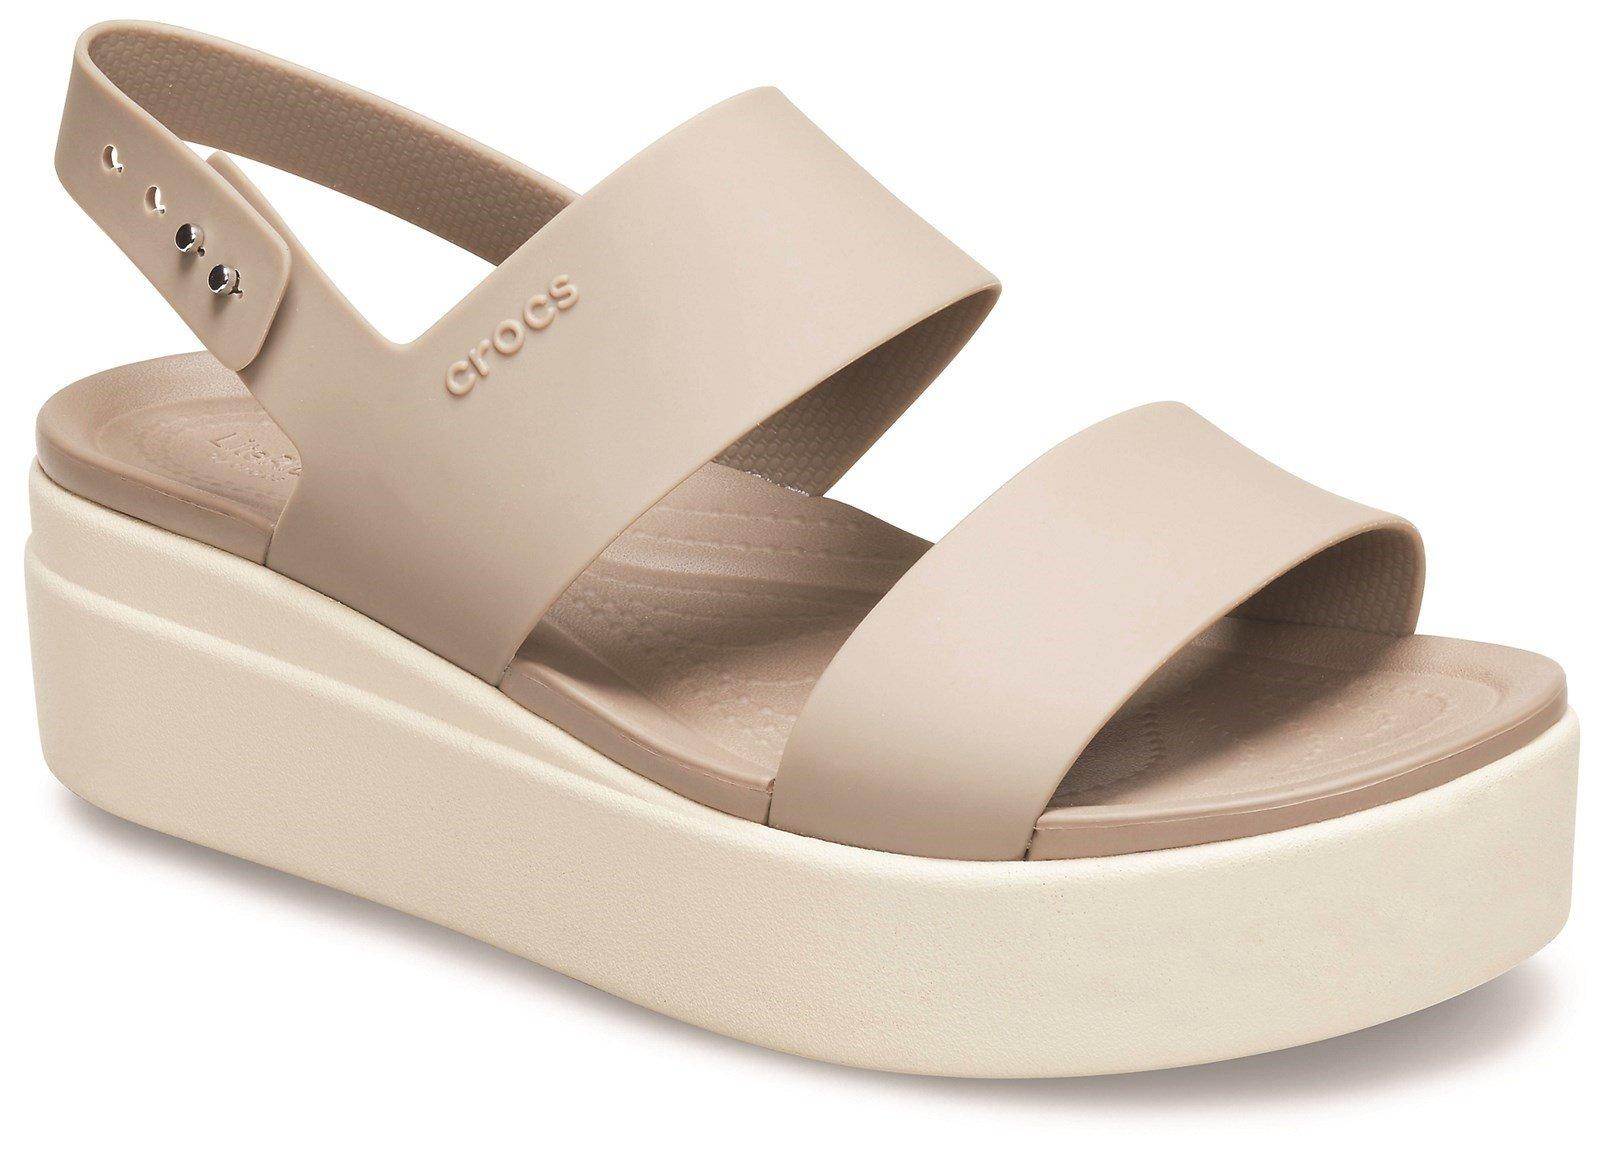 Crocs Women's Brooklyn Low Wedge Platform Sandal Various Colours 31458 - Cream 6